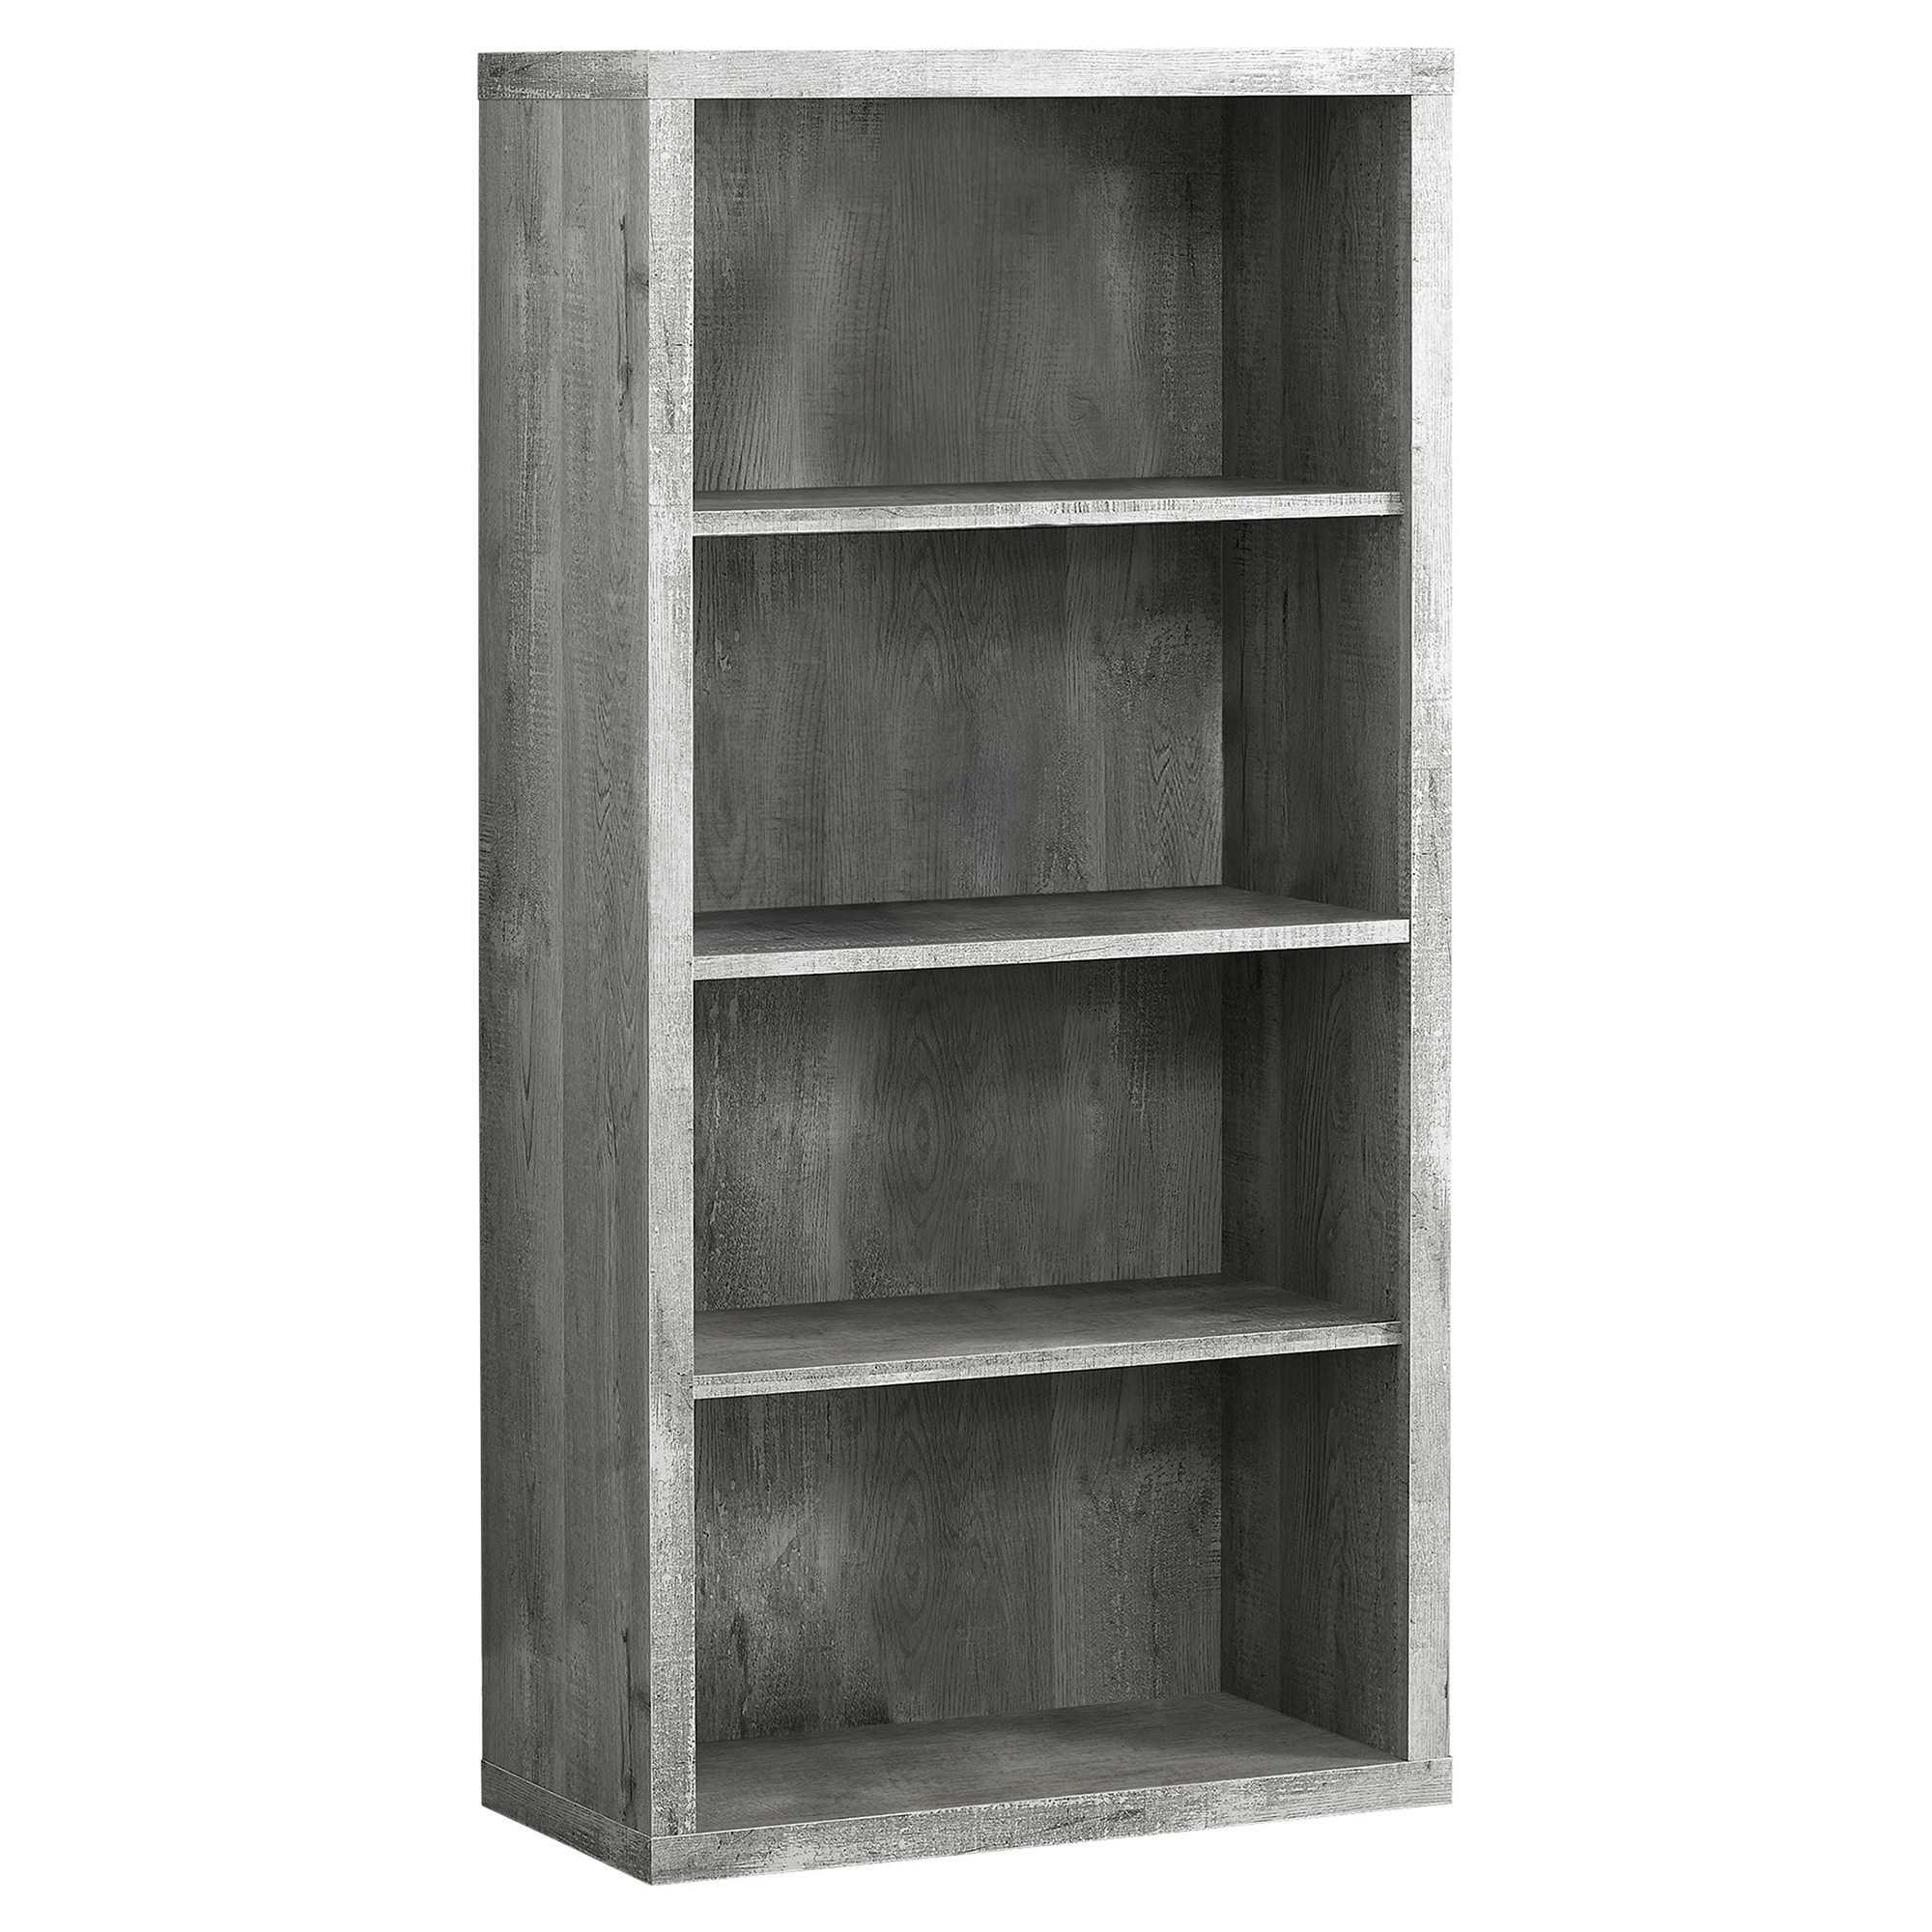 "11.75"" x 23.75"" x 47.5"" Grey Particle Board Adjustable Shelves  Bookshelf"